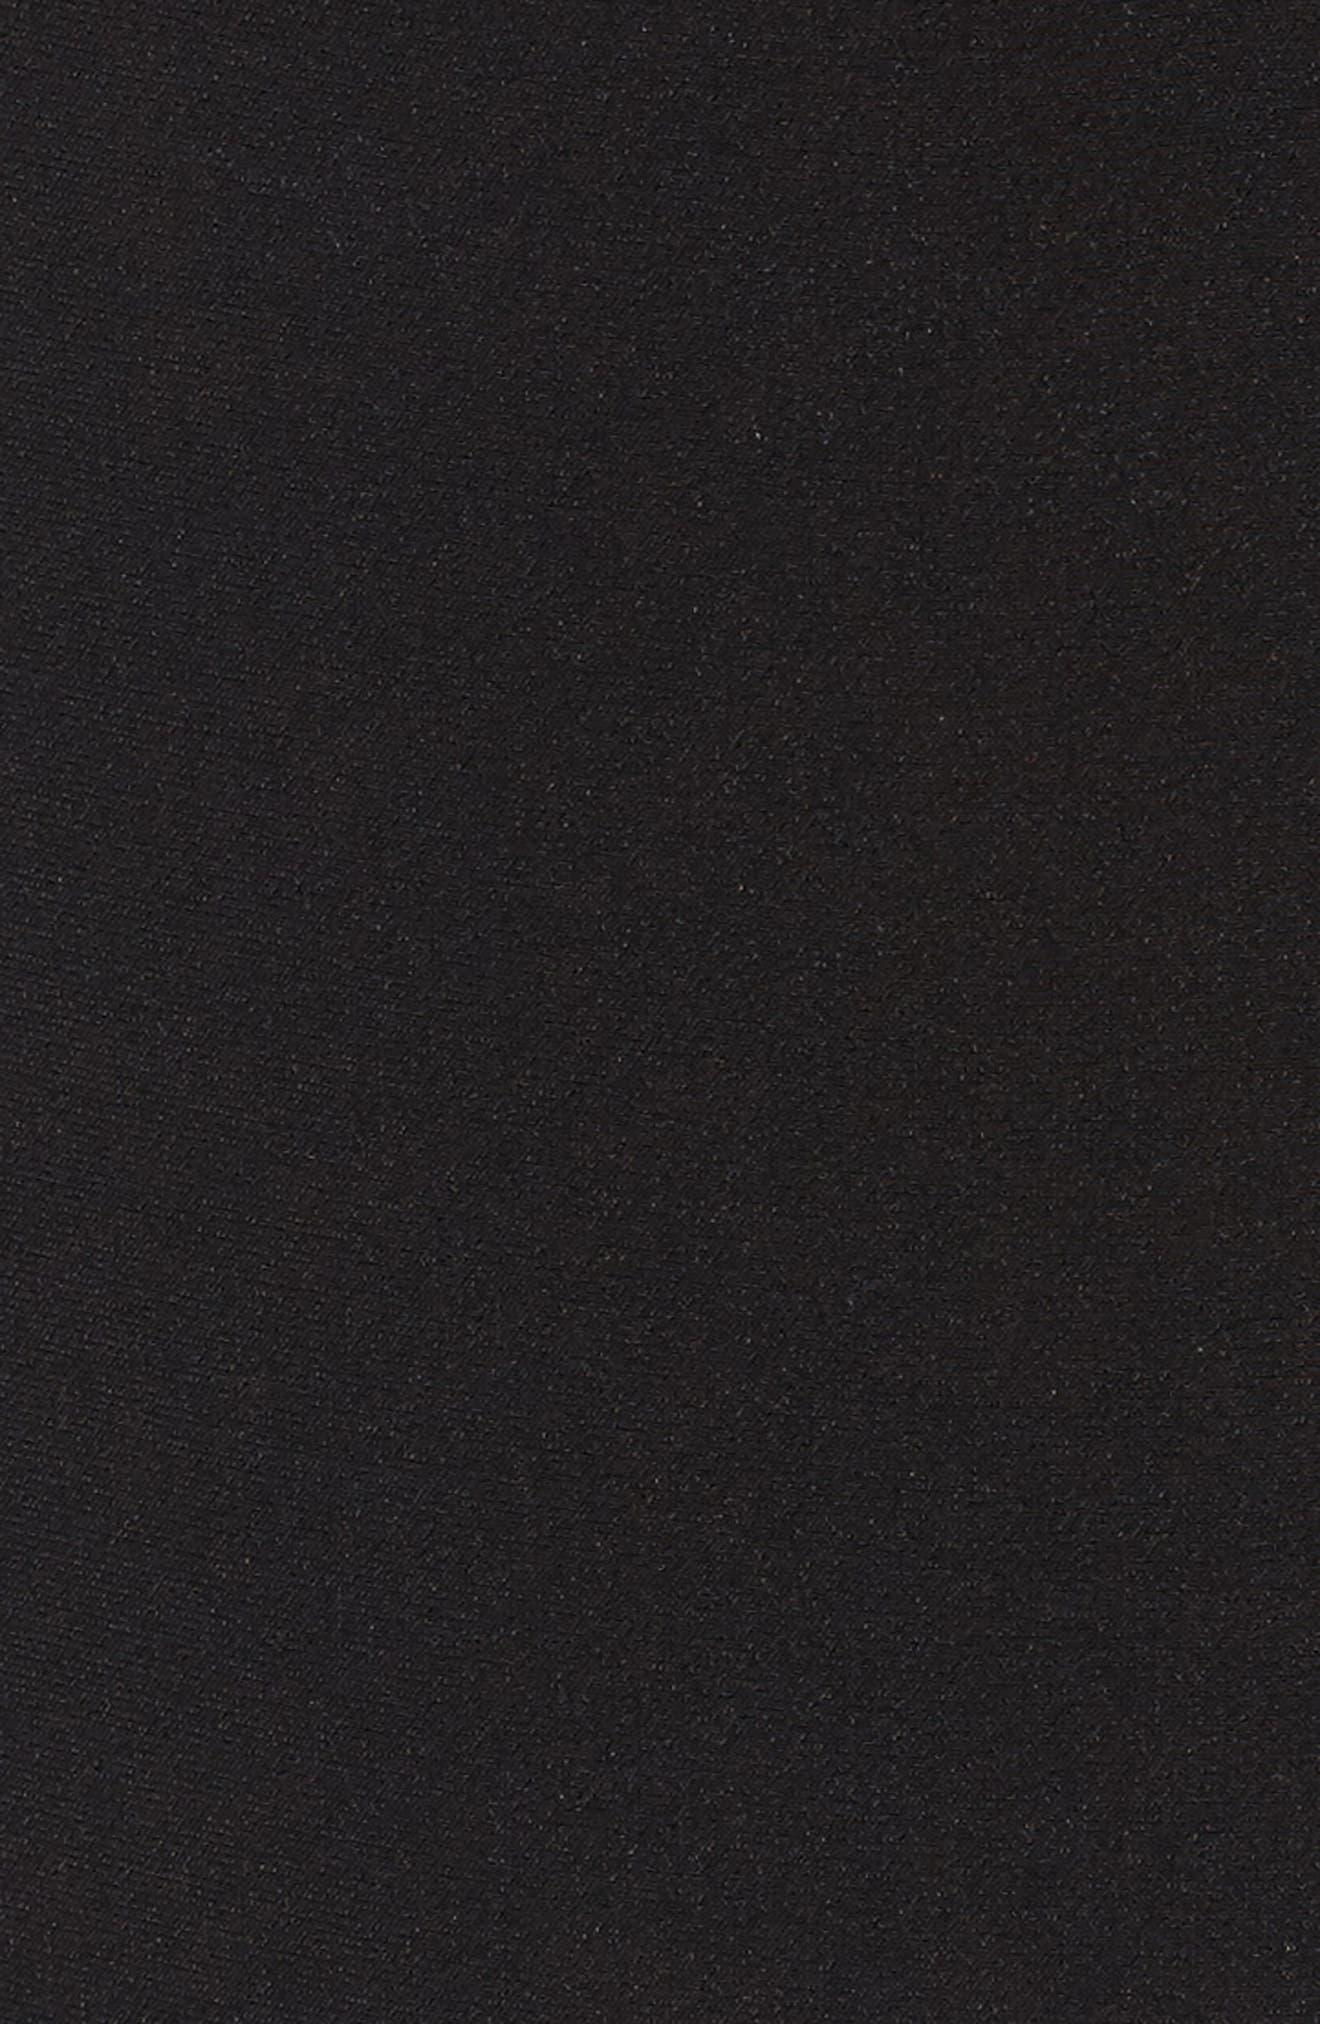 Melanie Thong Bodysuit,                             Alternate thumbnail 5, color,                             Black